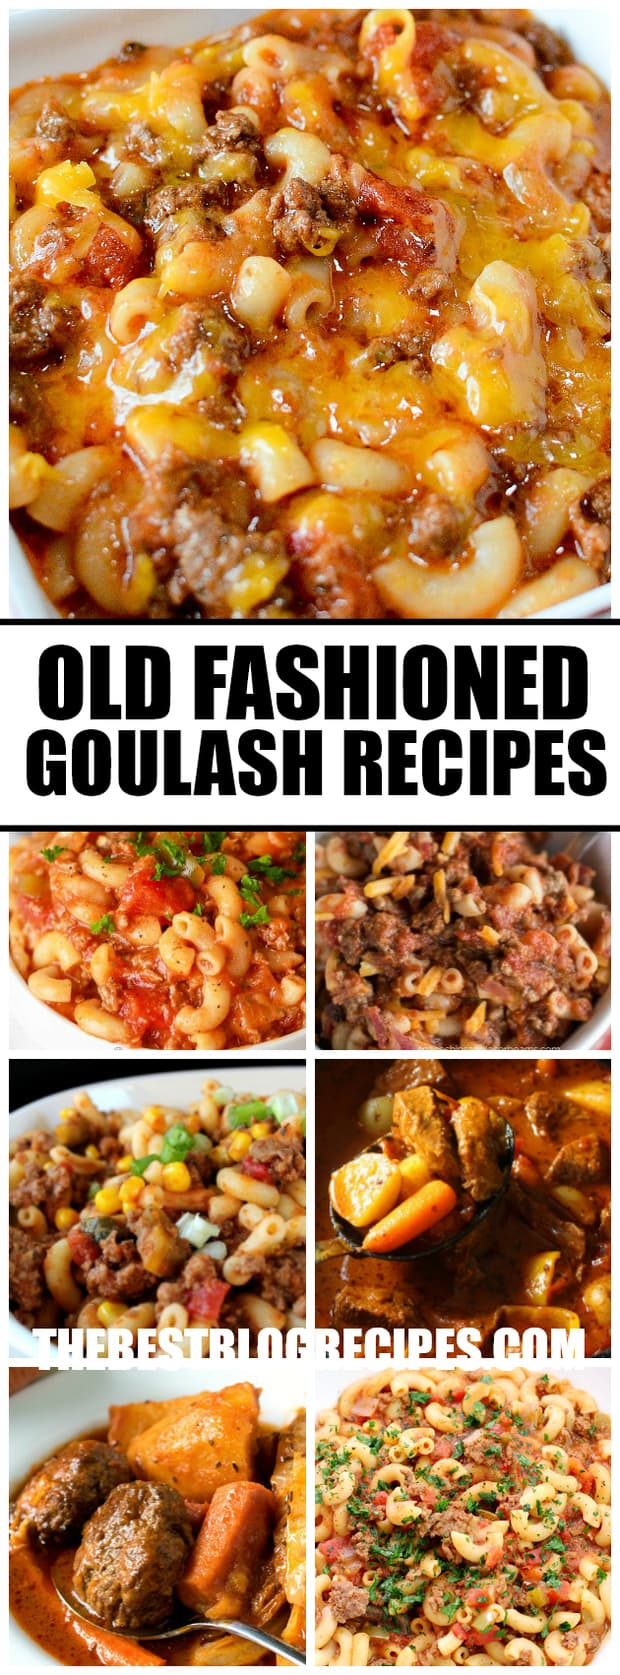 Old Fashioned Goulash Recipes